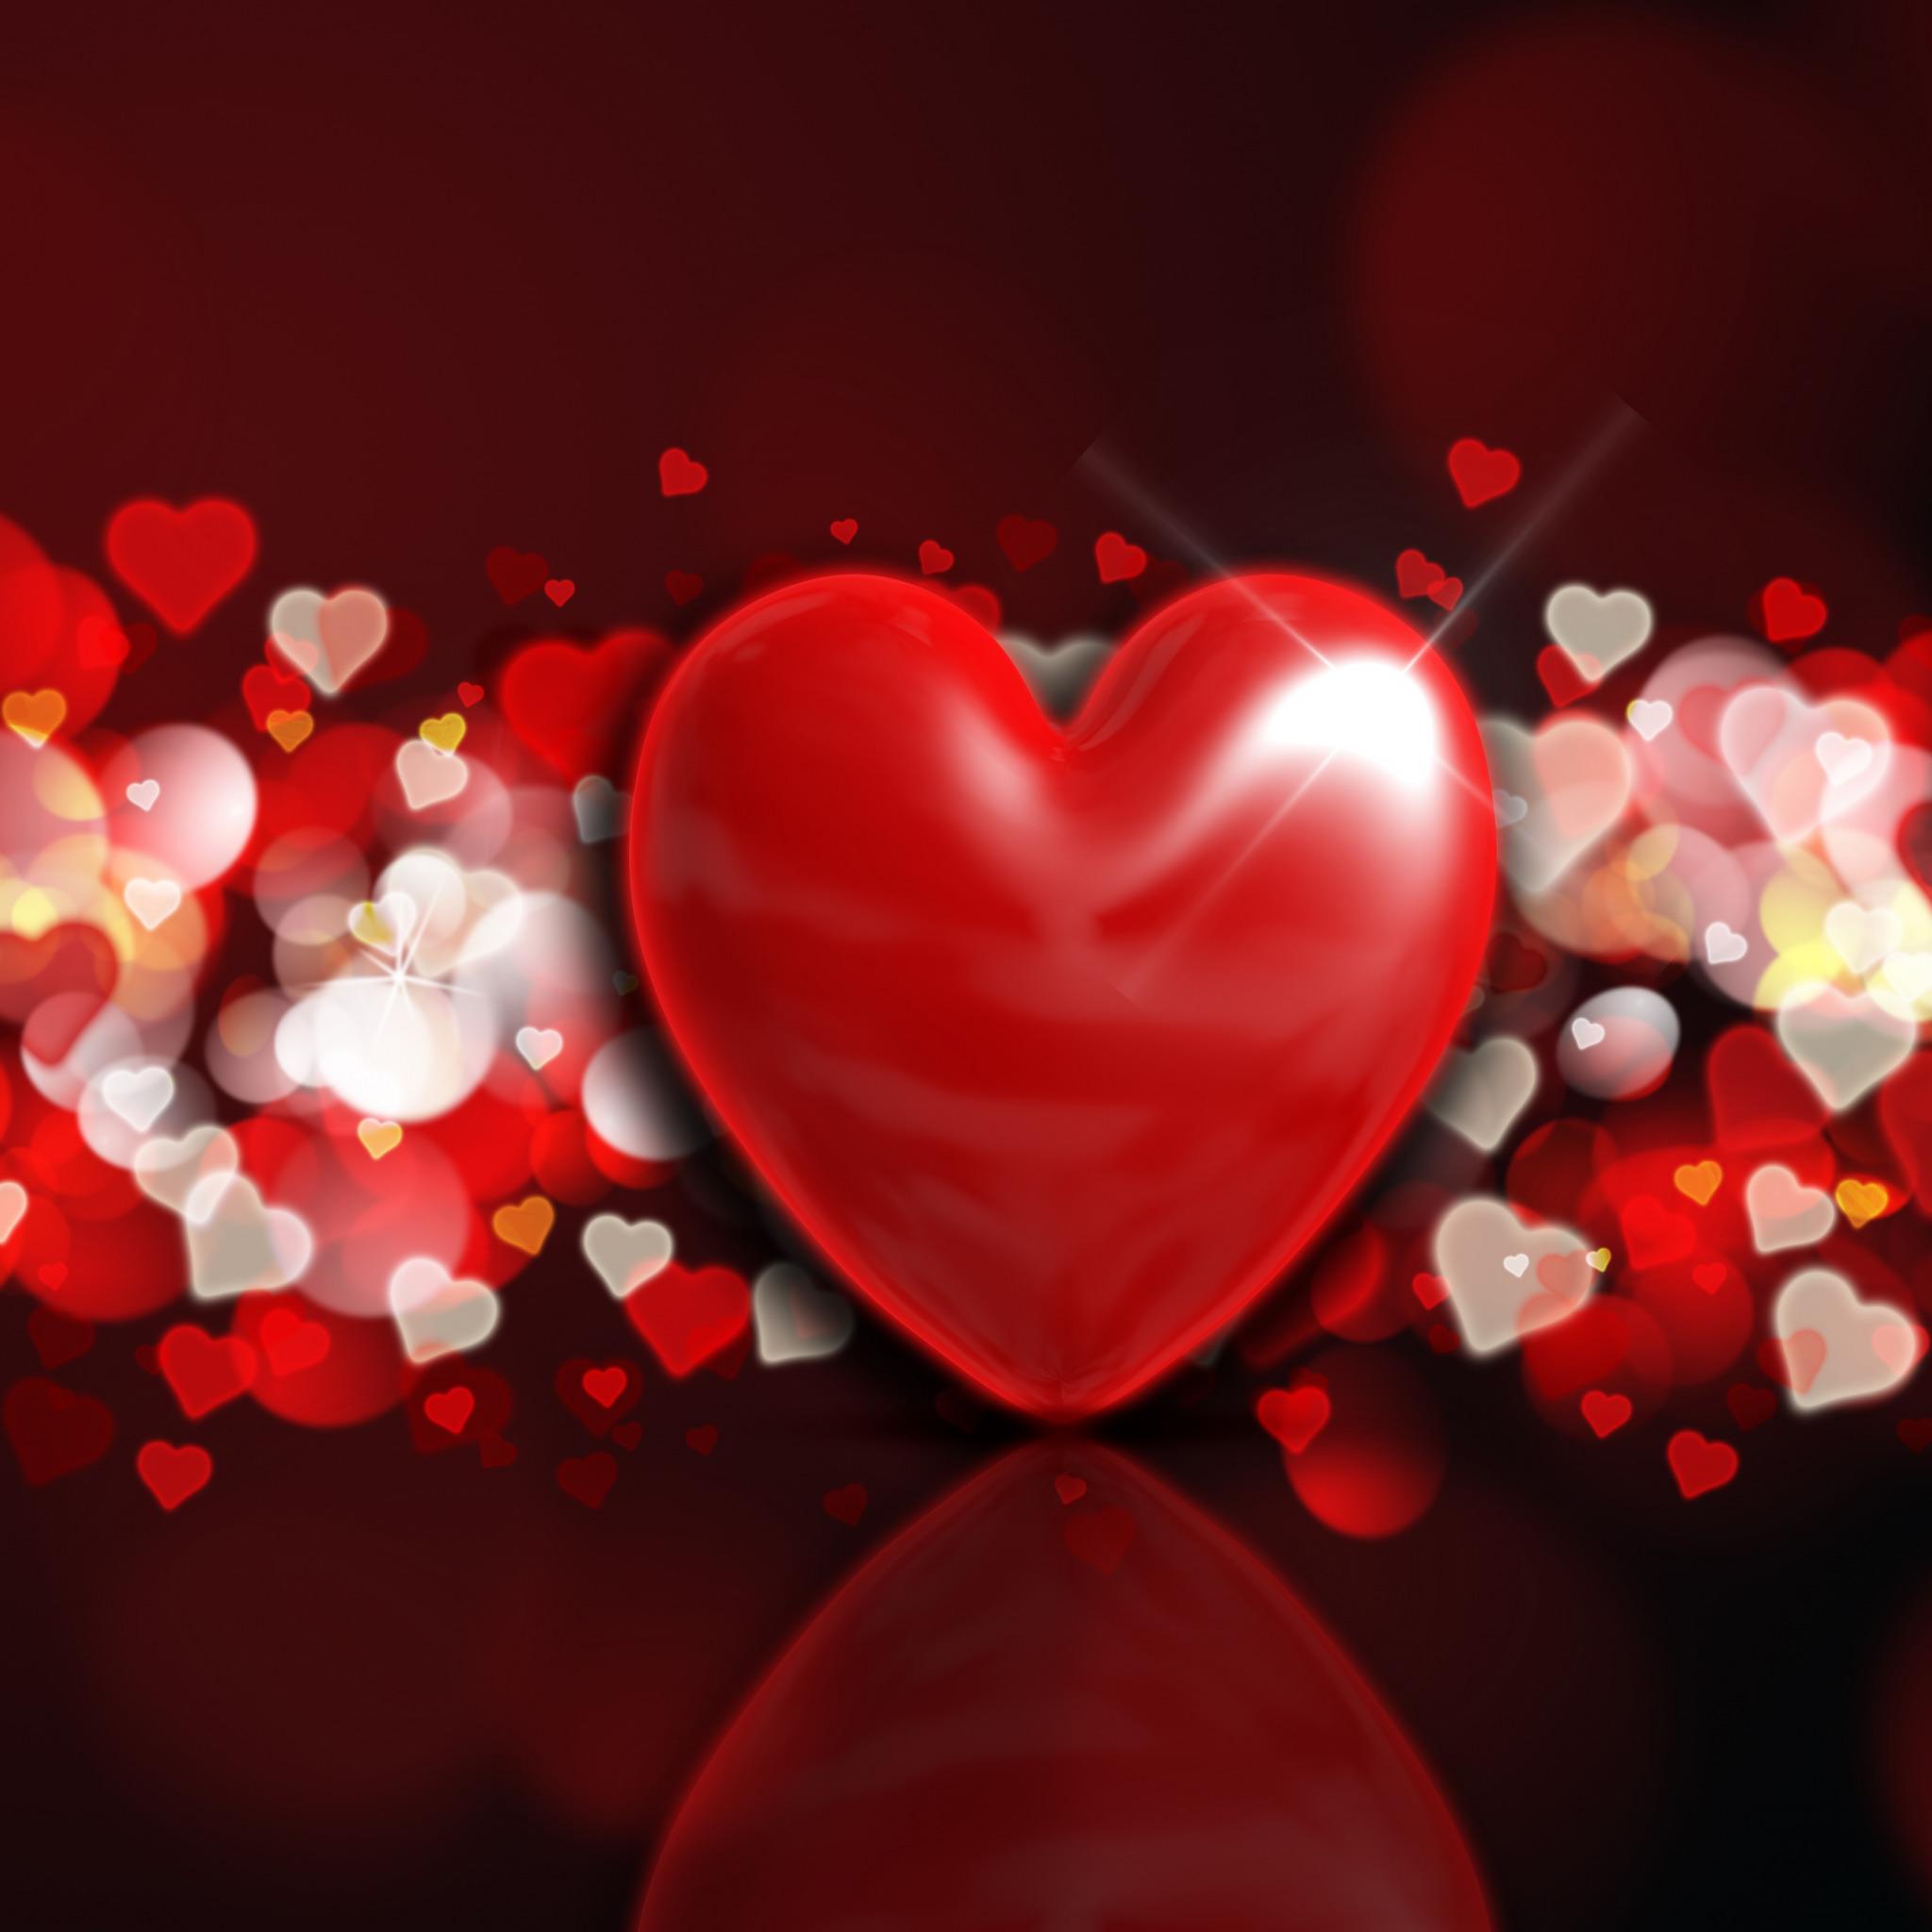 Картинки сердечки или о любви